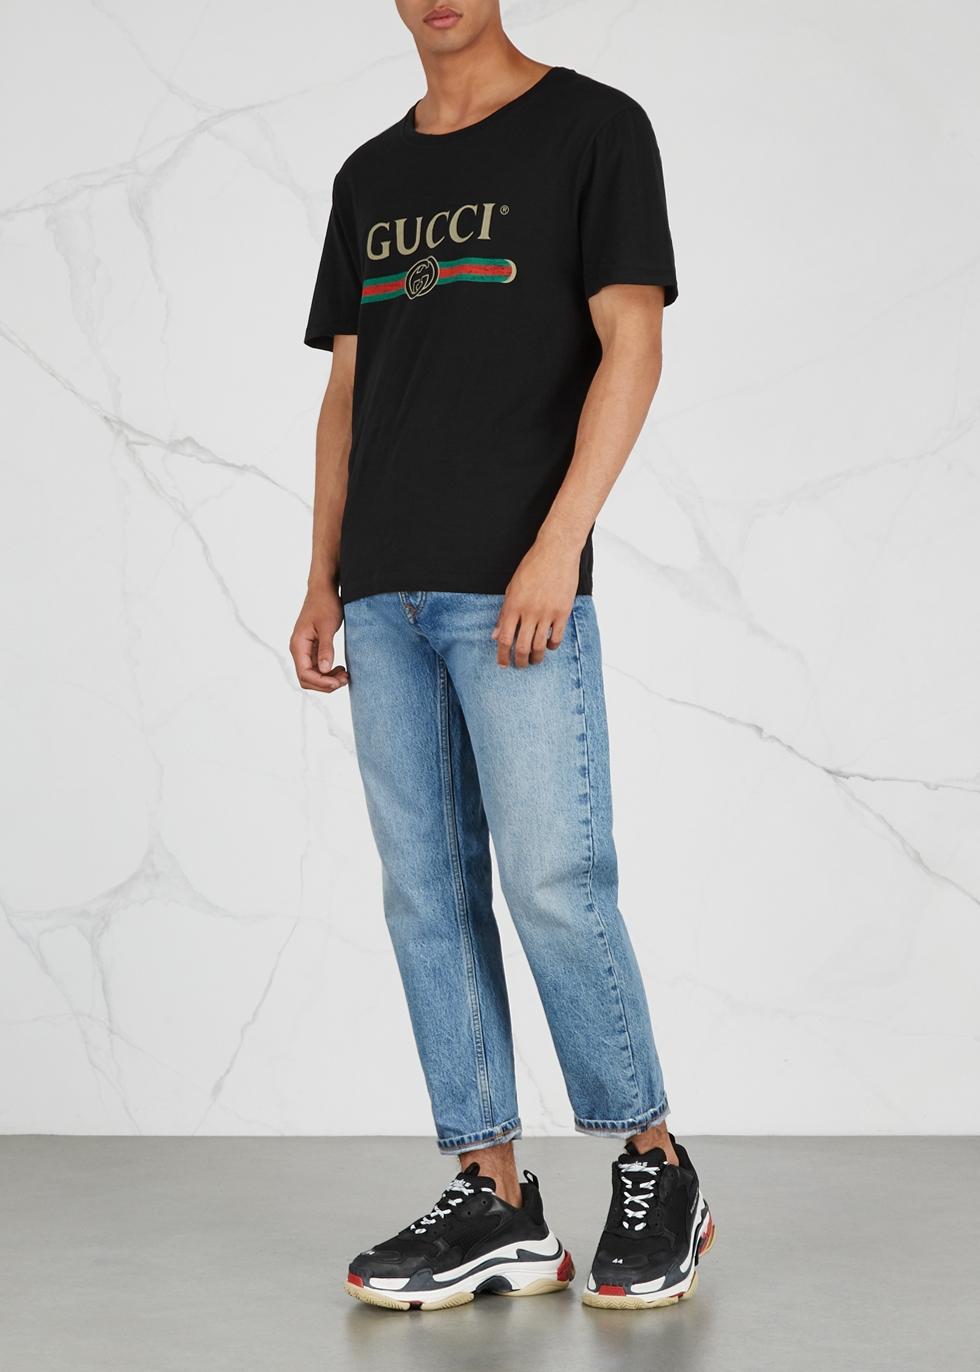 Men\'s Designer Clothing, Shoes and Bags - Harvey Nichols